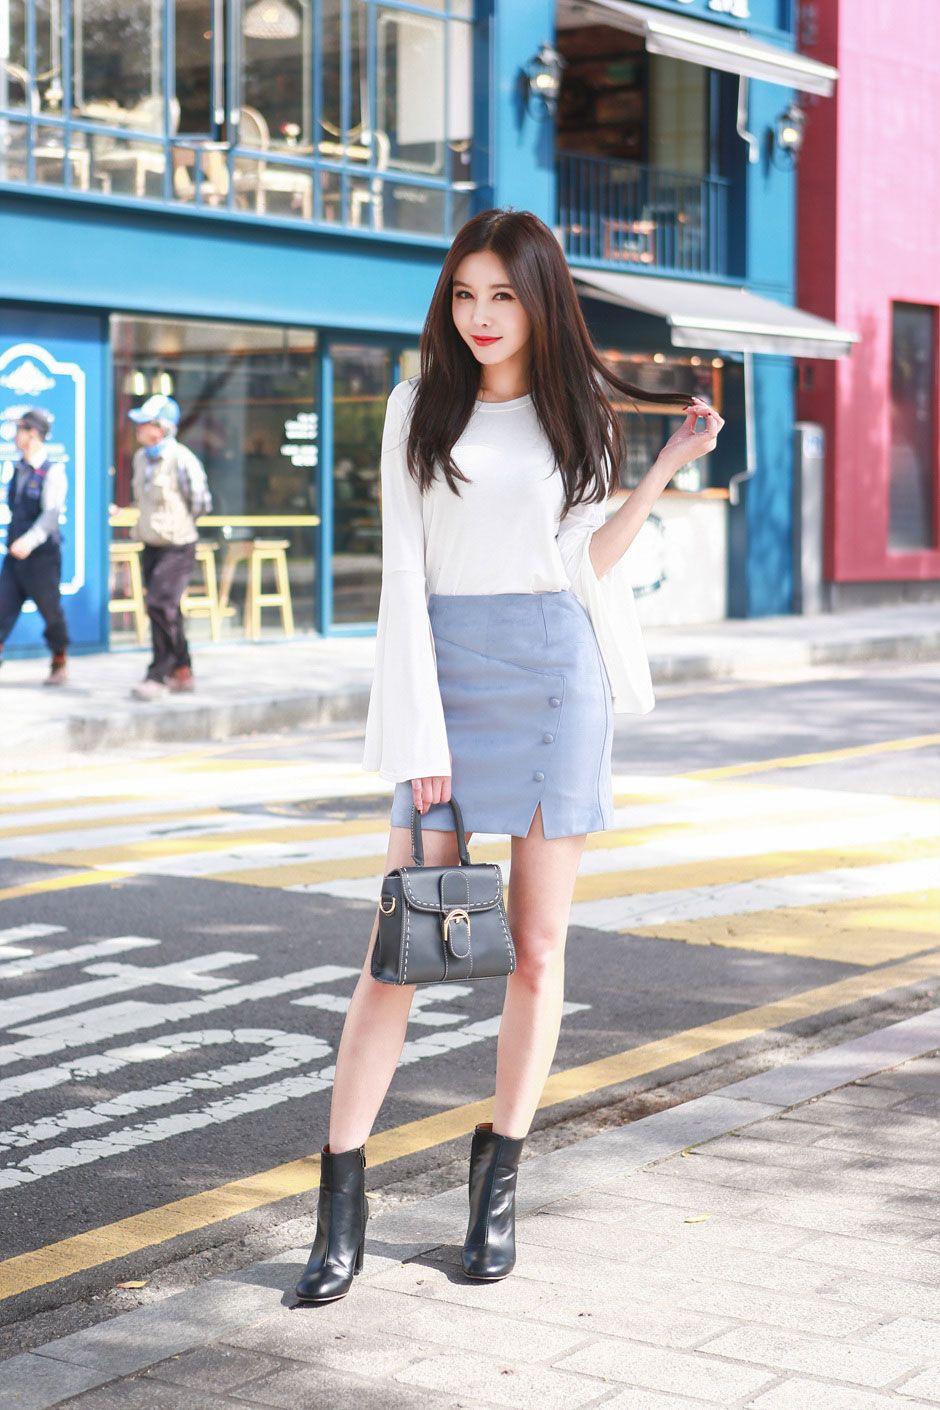 Korean Fashion Spring Feminine Elegant Casual Urban Chic